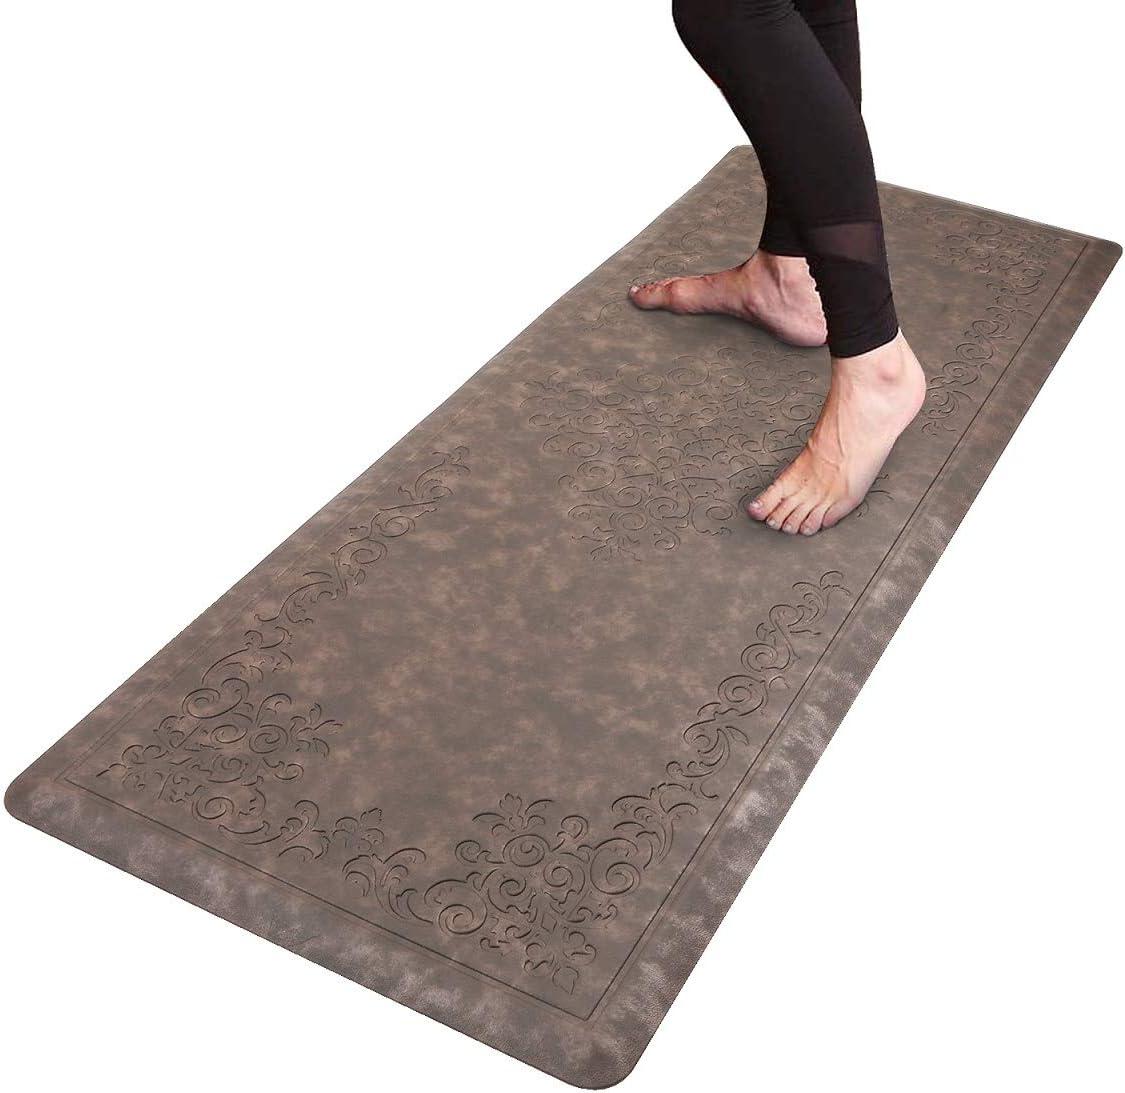 "HEBE Kitchen Mat Cushioned Anti-Fatigue Floor Mat Runner Waterproof Non-Slip Standing Mat Ergonomic Comfort Floor Mat Rug Runner for Office,Sink,Laundry,Desk,20""x52"""